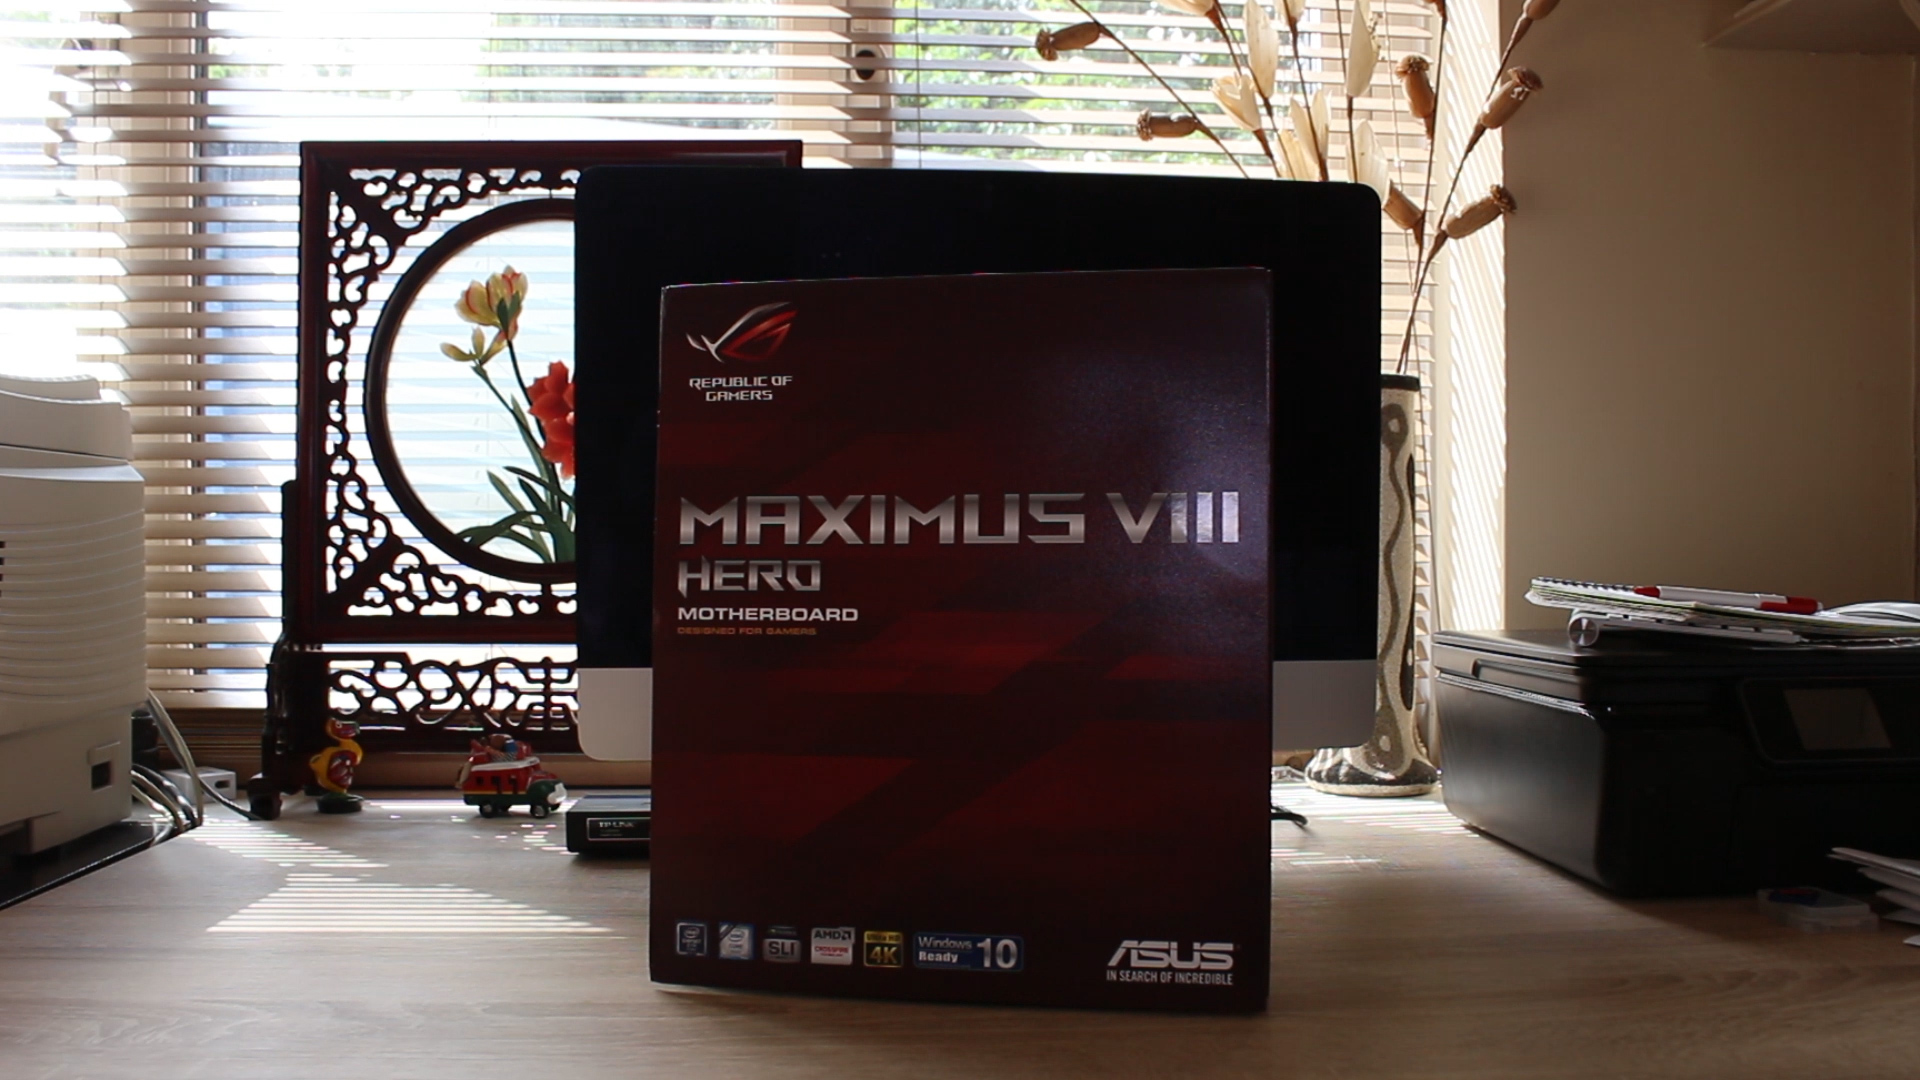 Asus Maximus VIII Hero Z170 Motherboard Review | TechteamGB